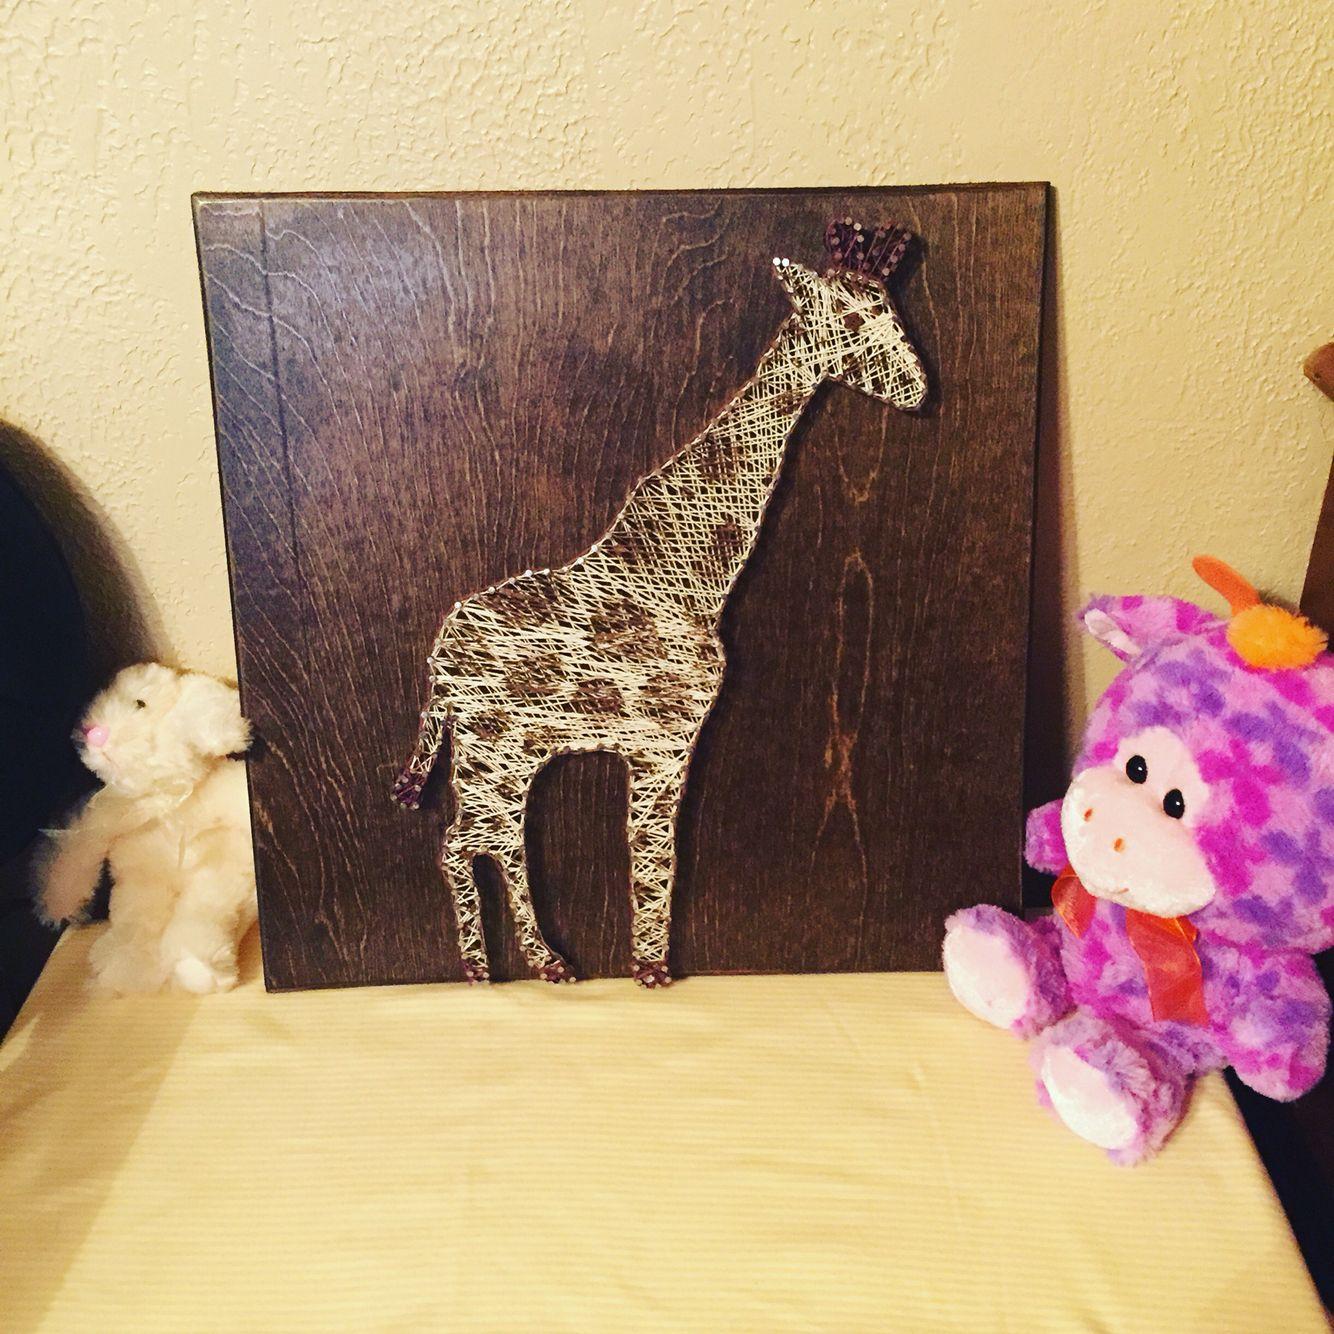 Giraffe string art! | Diy | Pinterest | String art, Giraffe and Craft